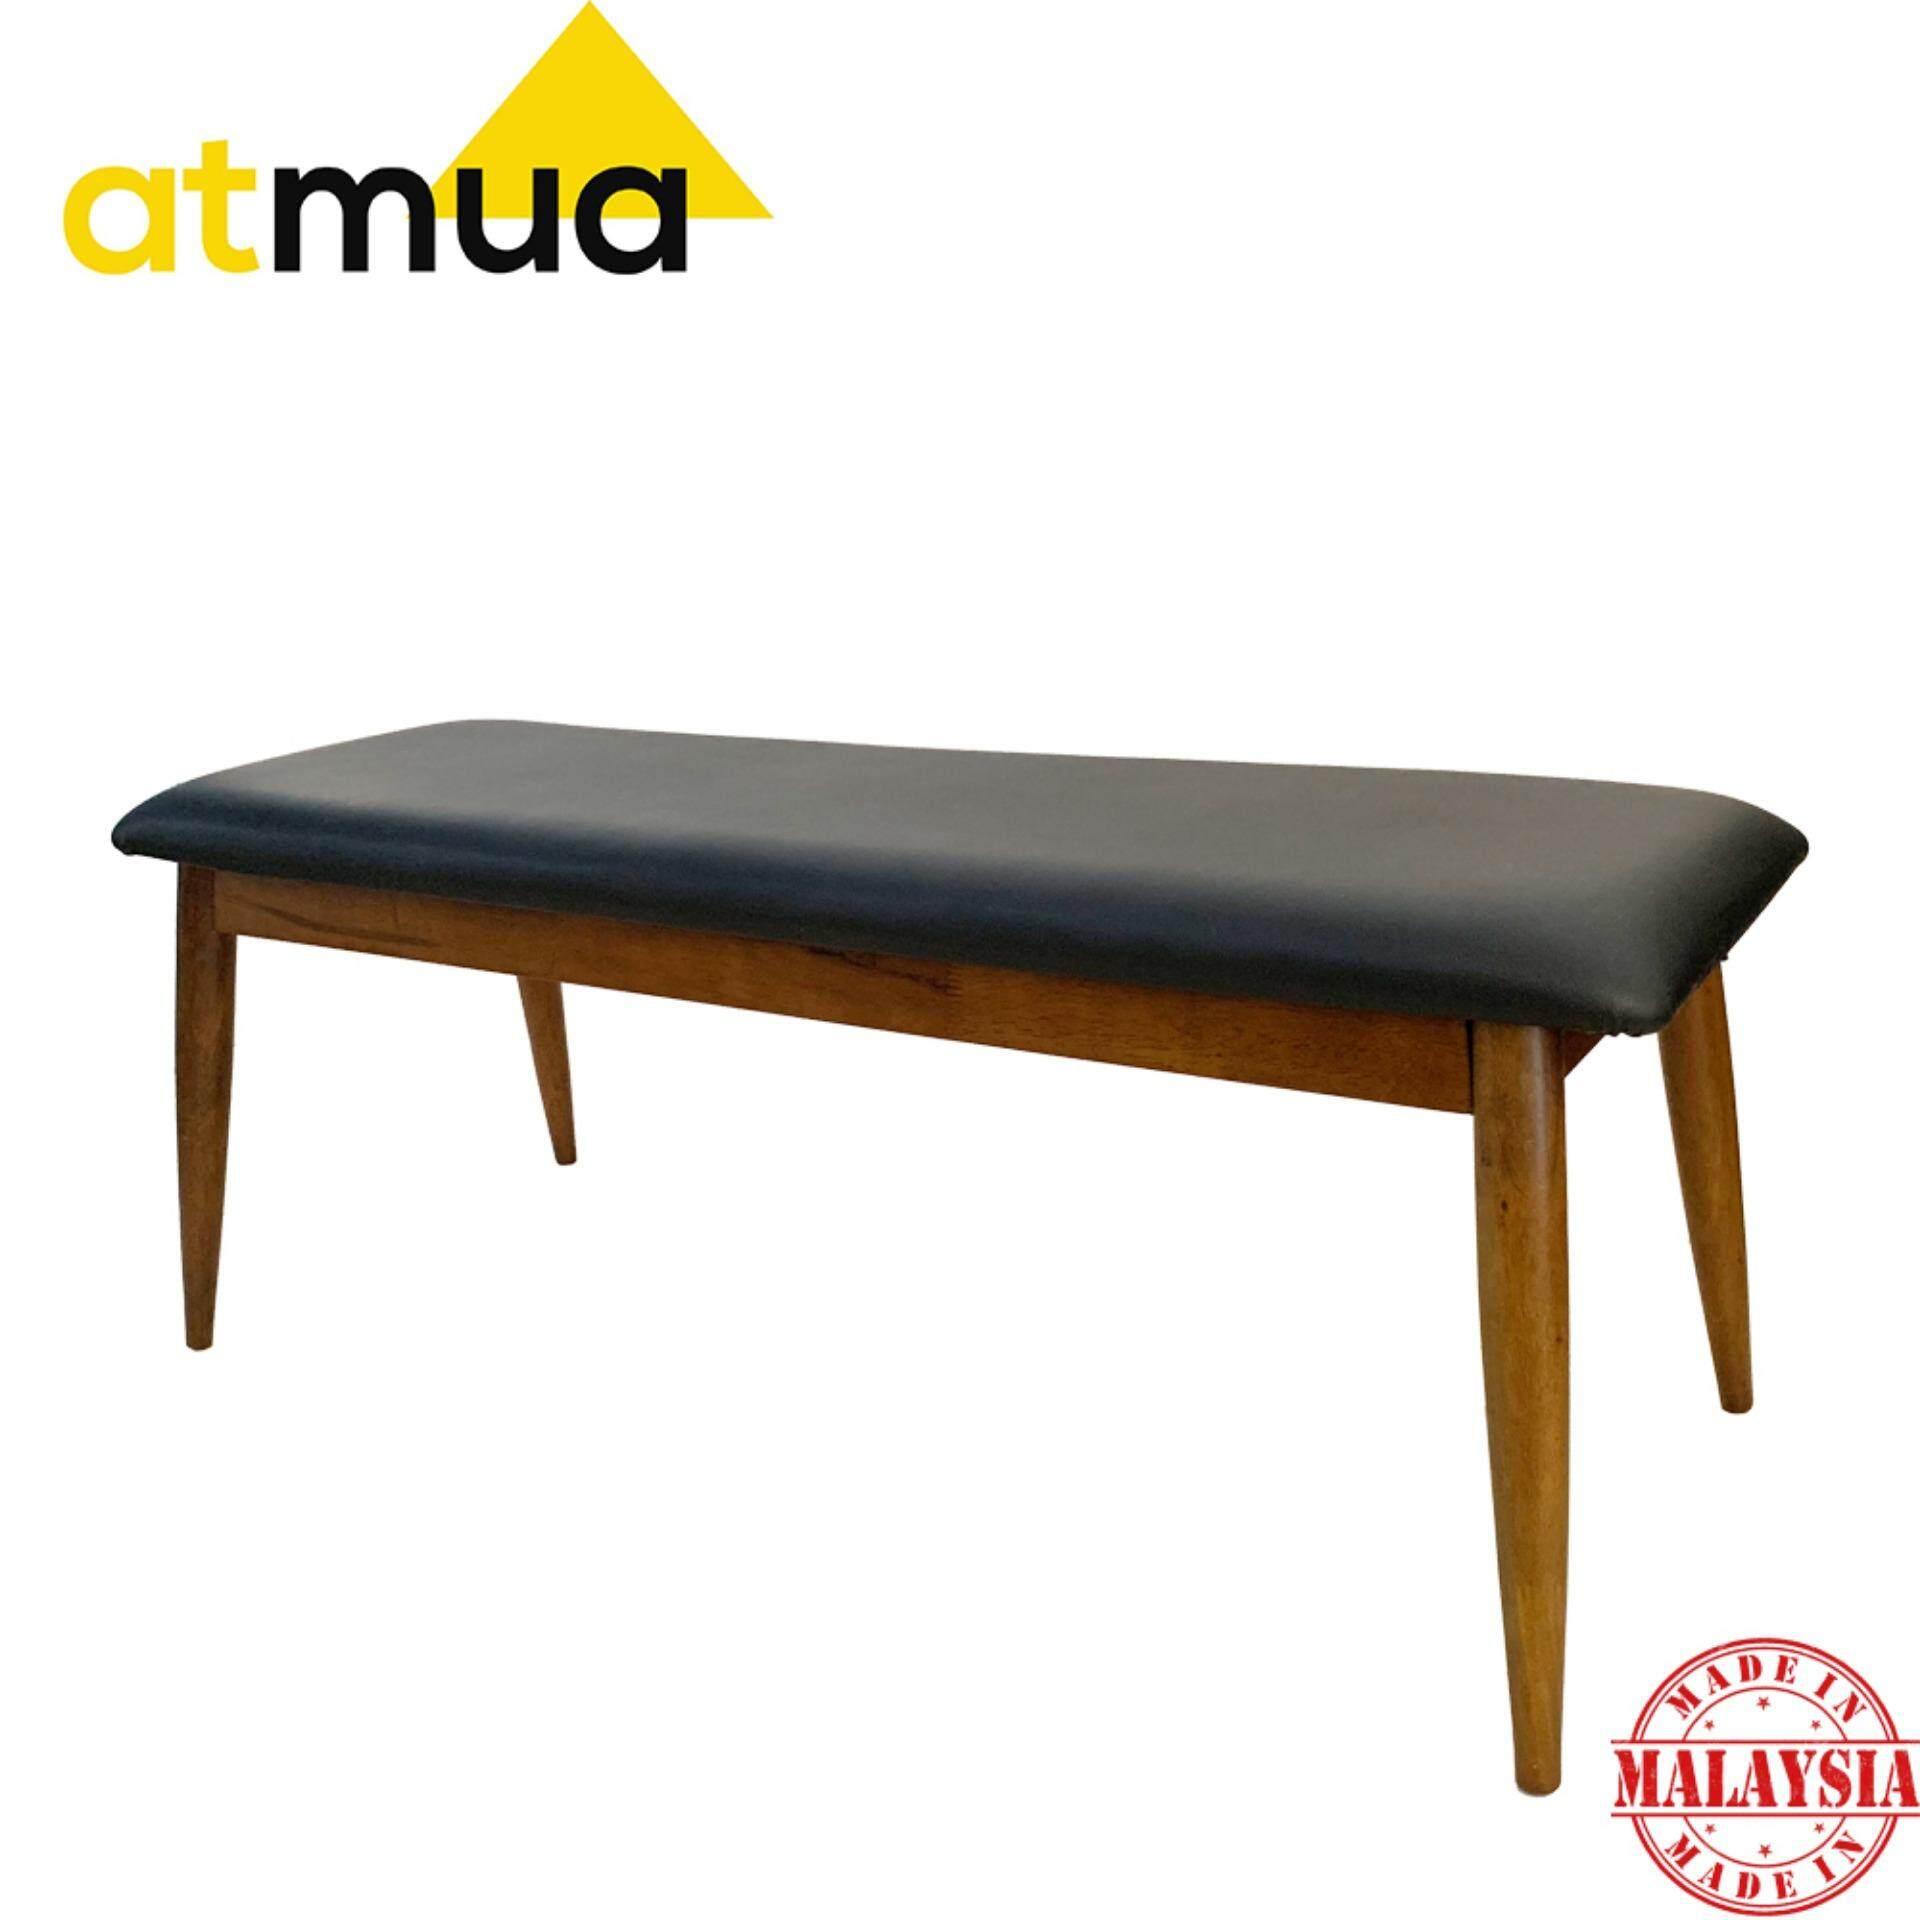 Atmua Borato Bench Chair for Indoor (Scandinavian Style) [Full Solid Wood]